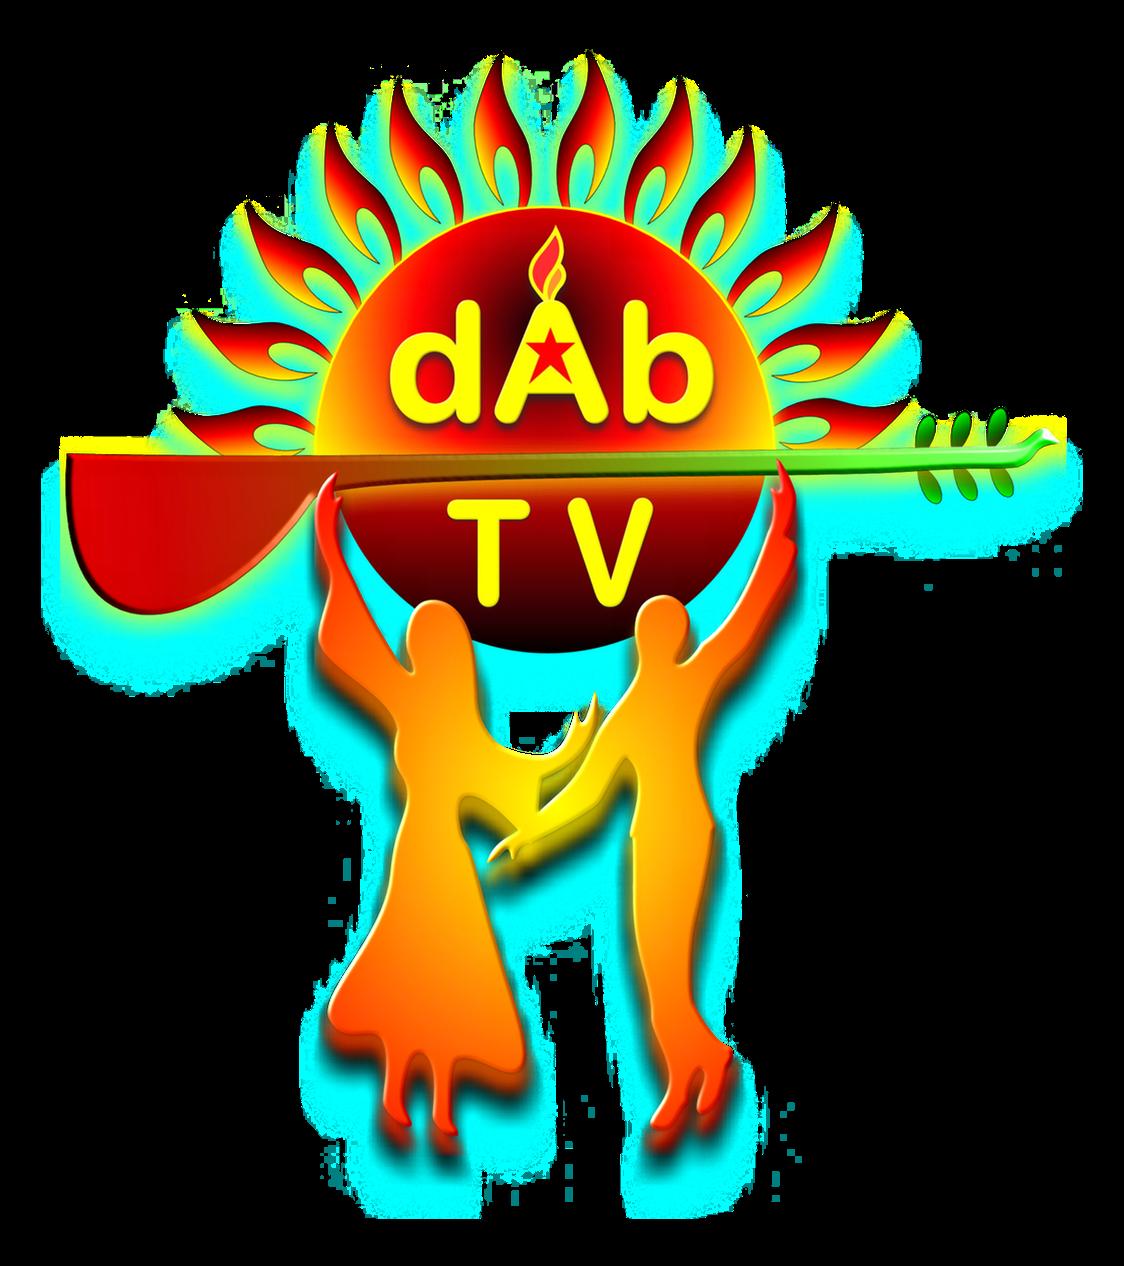 DAB Tvx3